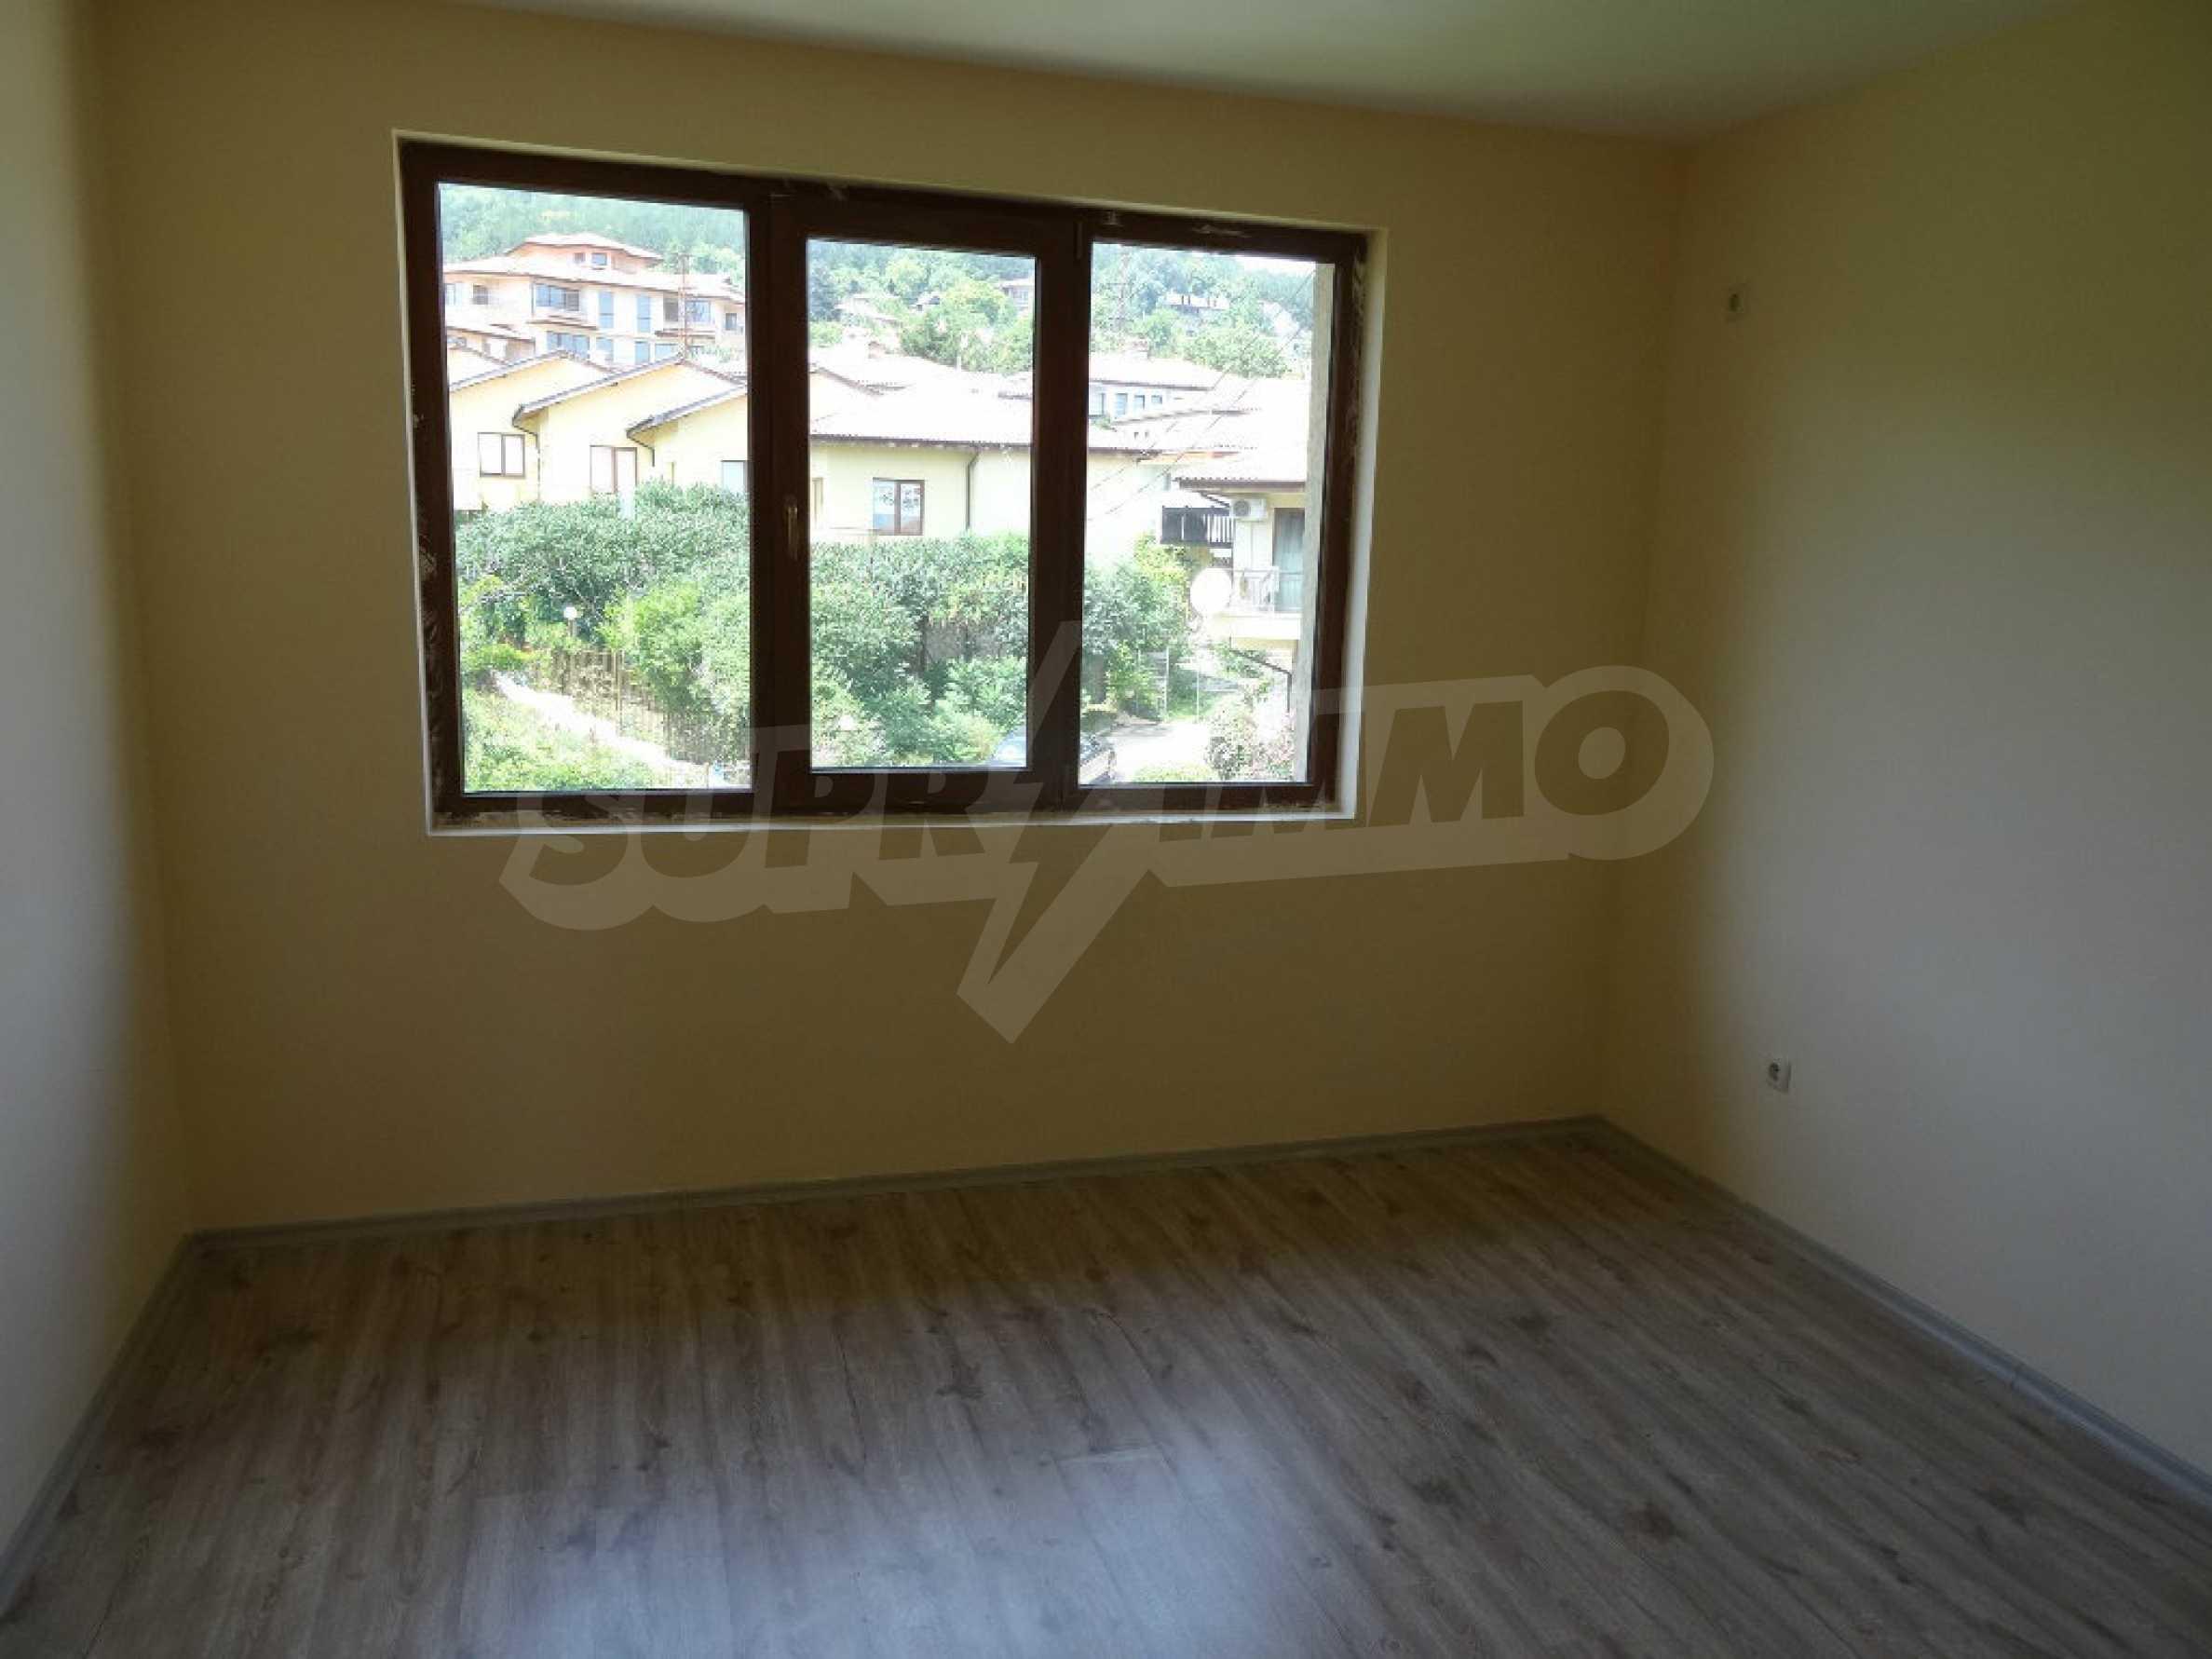 Тристаен апартамент до ключ близо до курорти Албена и Кранево 4